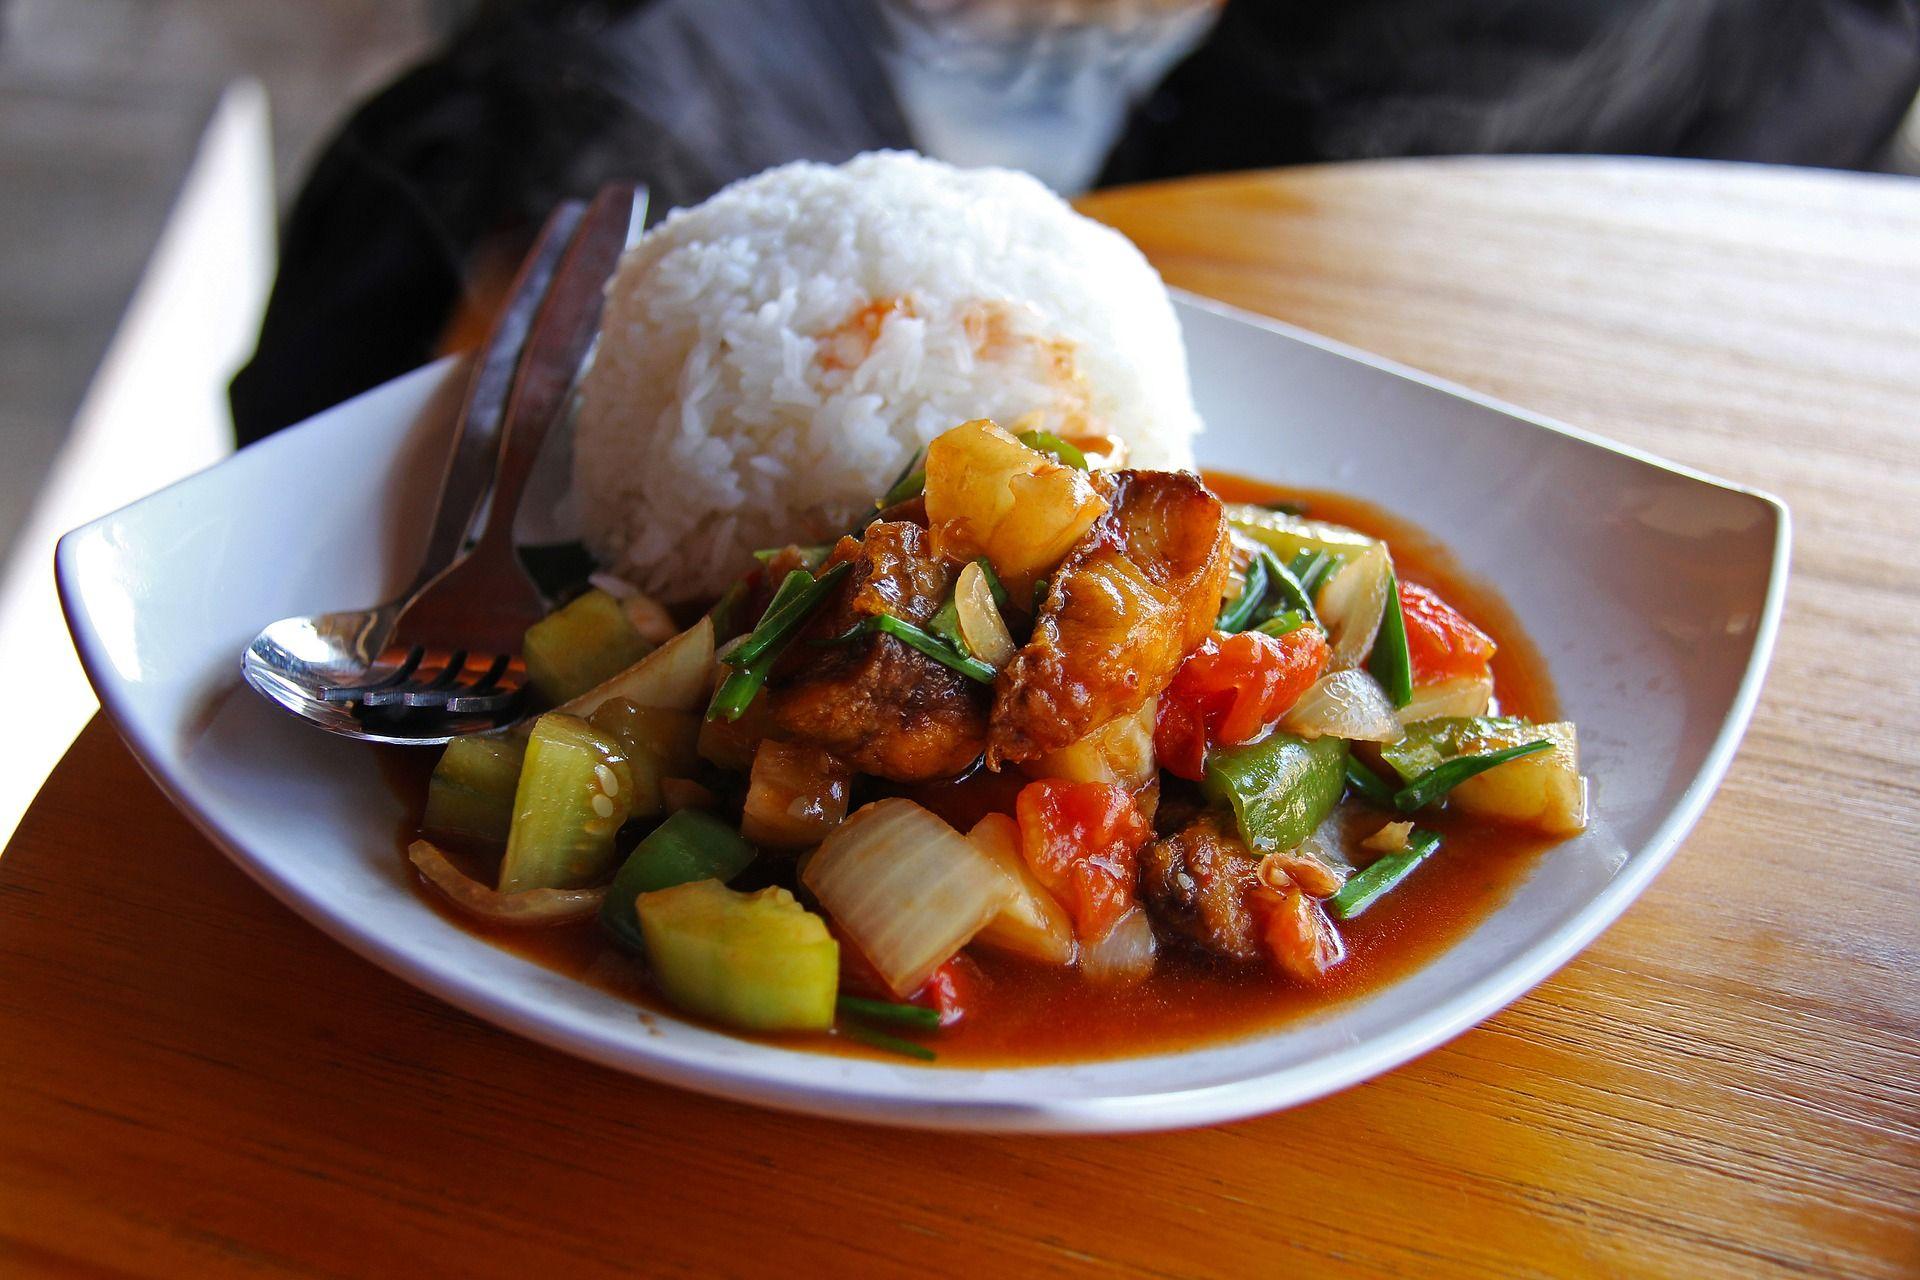 Berbuka Puasa Dengan Menu Makanan Apa Saja Tetap Nikmat Belajar Sederhana Halaman 1 Kompasiana Com